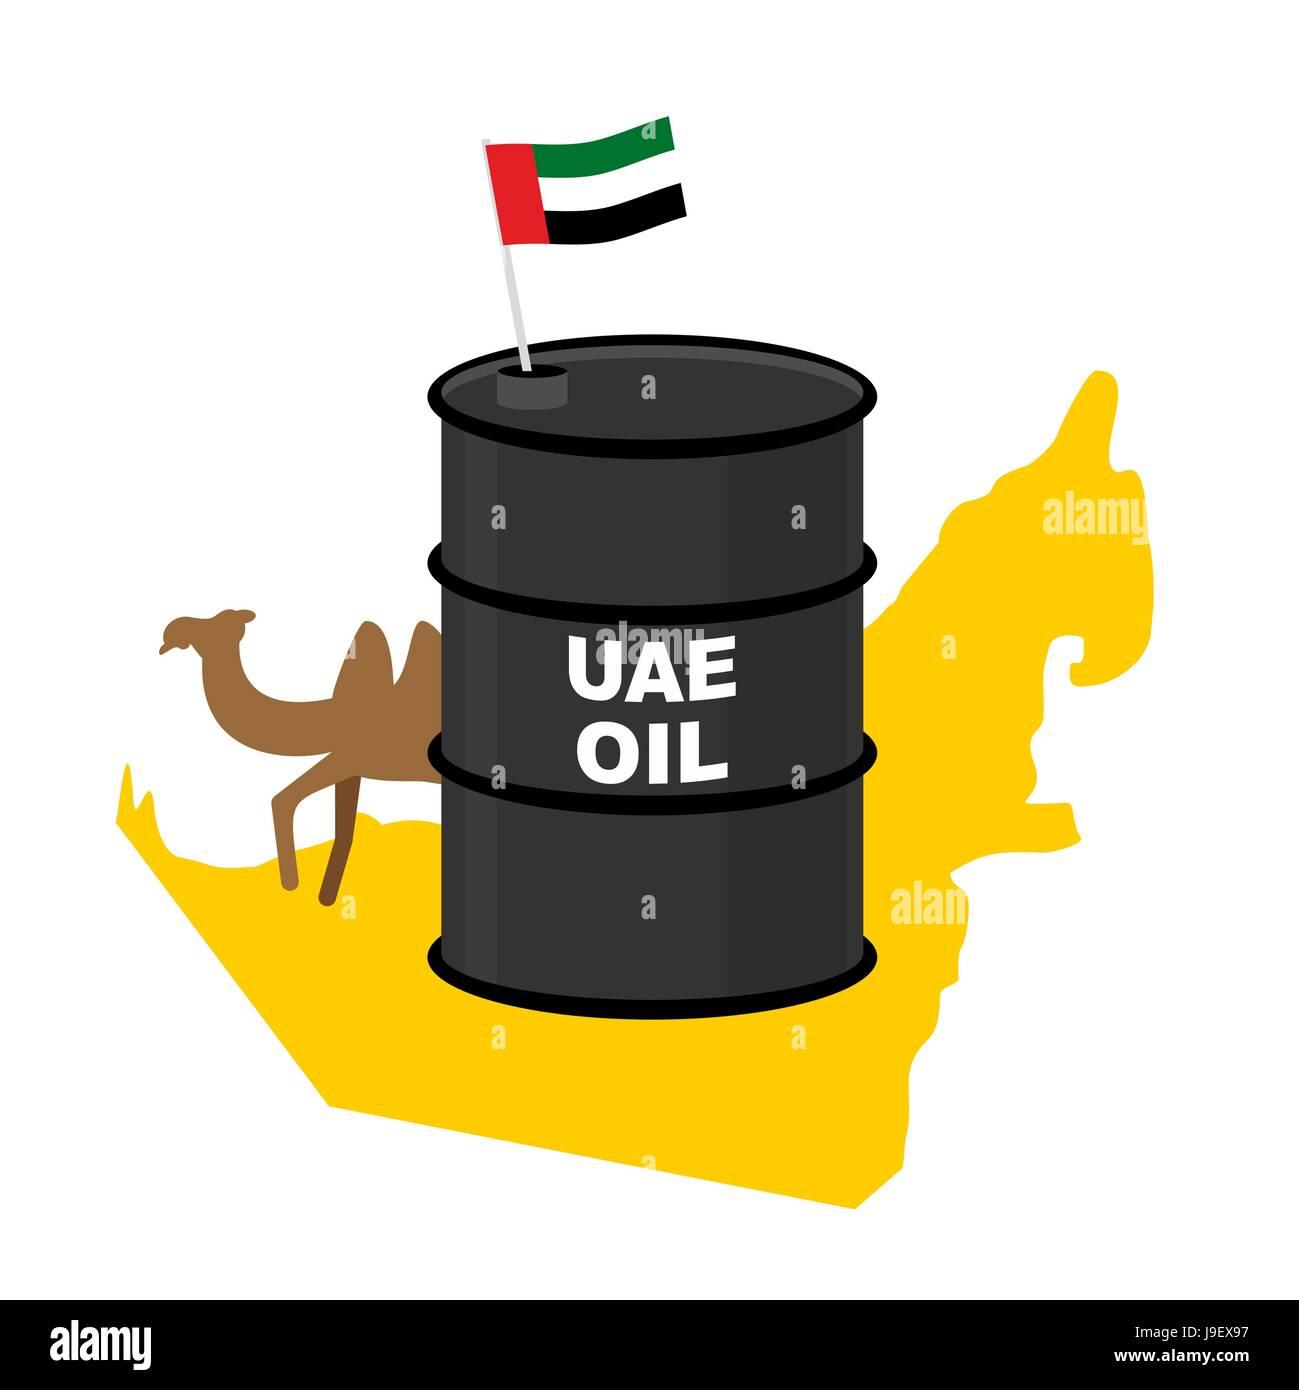 Barrel oil UAE  map background. Flag United Arab Emirates. Camel peeks out from behind barrels. Vector illustration - Stock Image